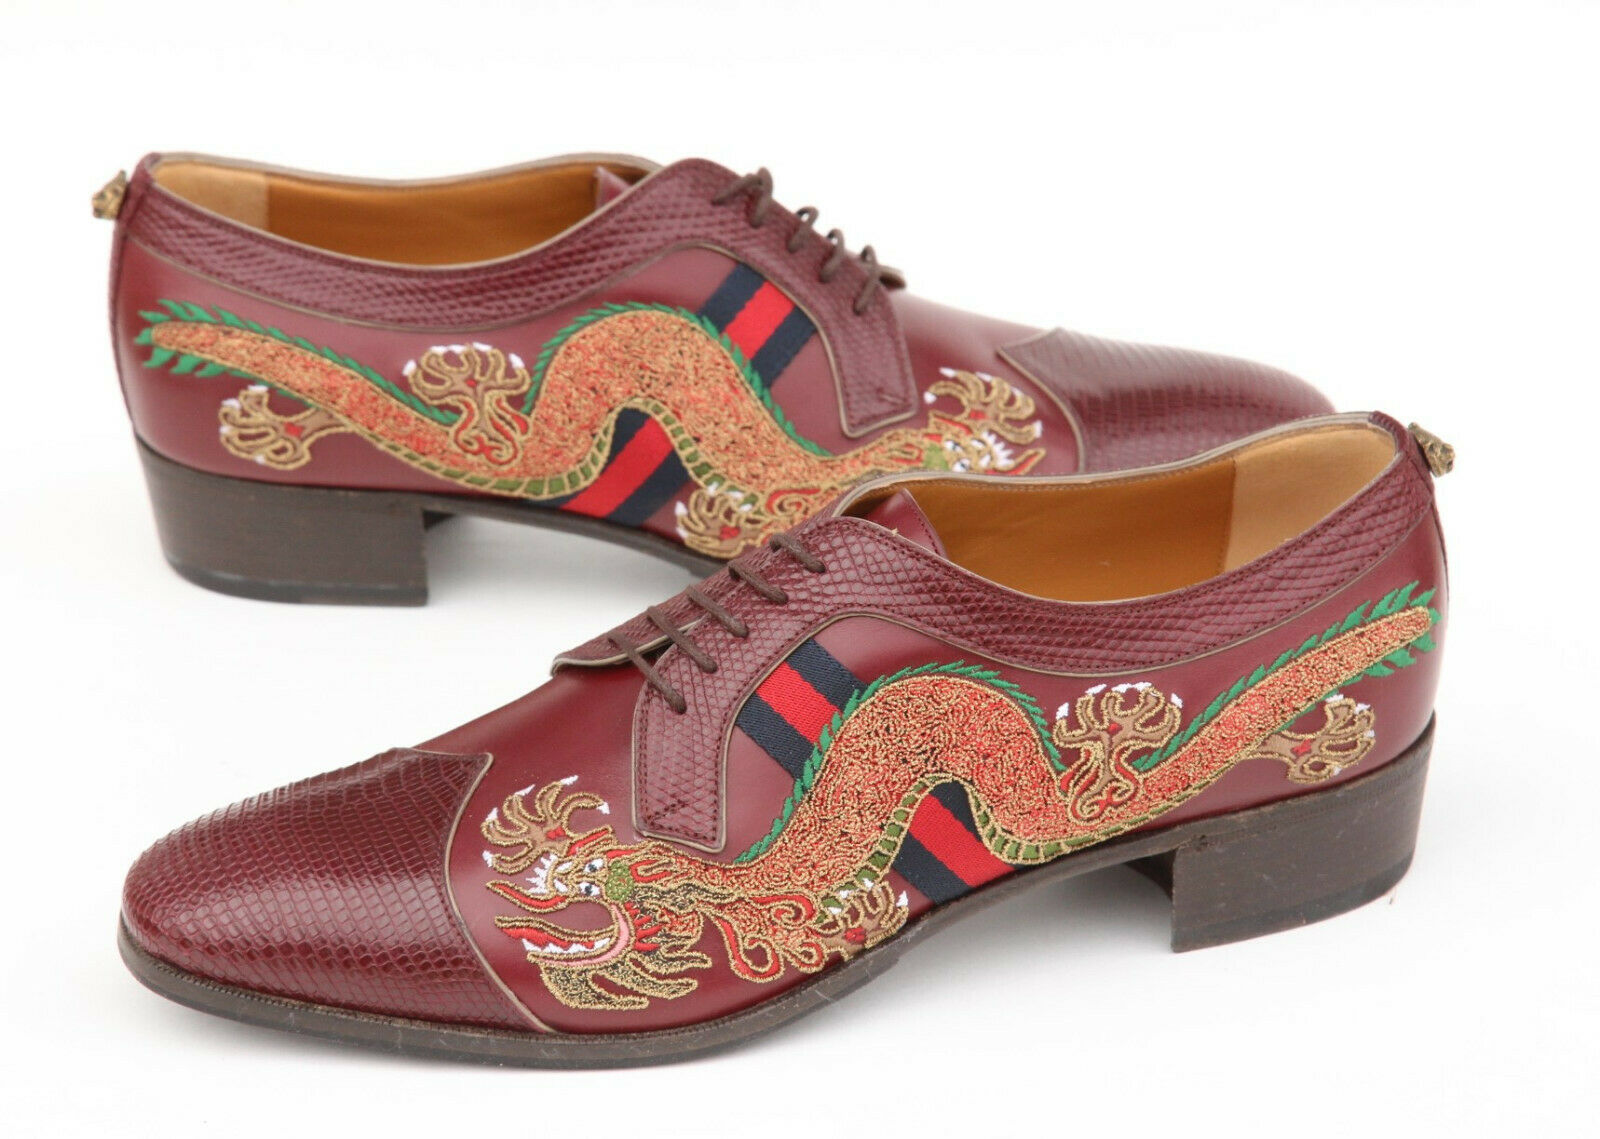 GUCCI Dragon Embroidery Lizard Cap Toe Oxford Mens Shoes UK 95 US 10